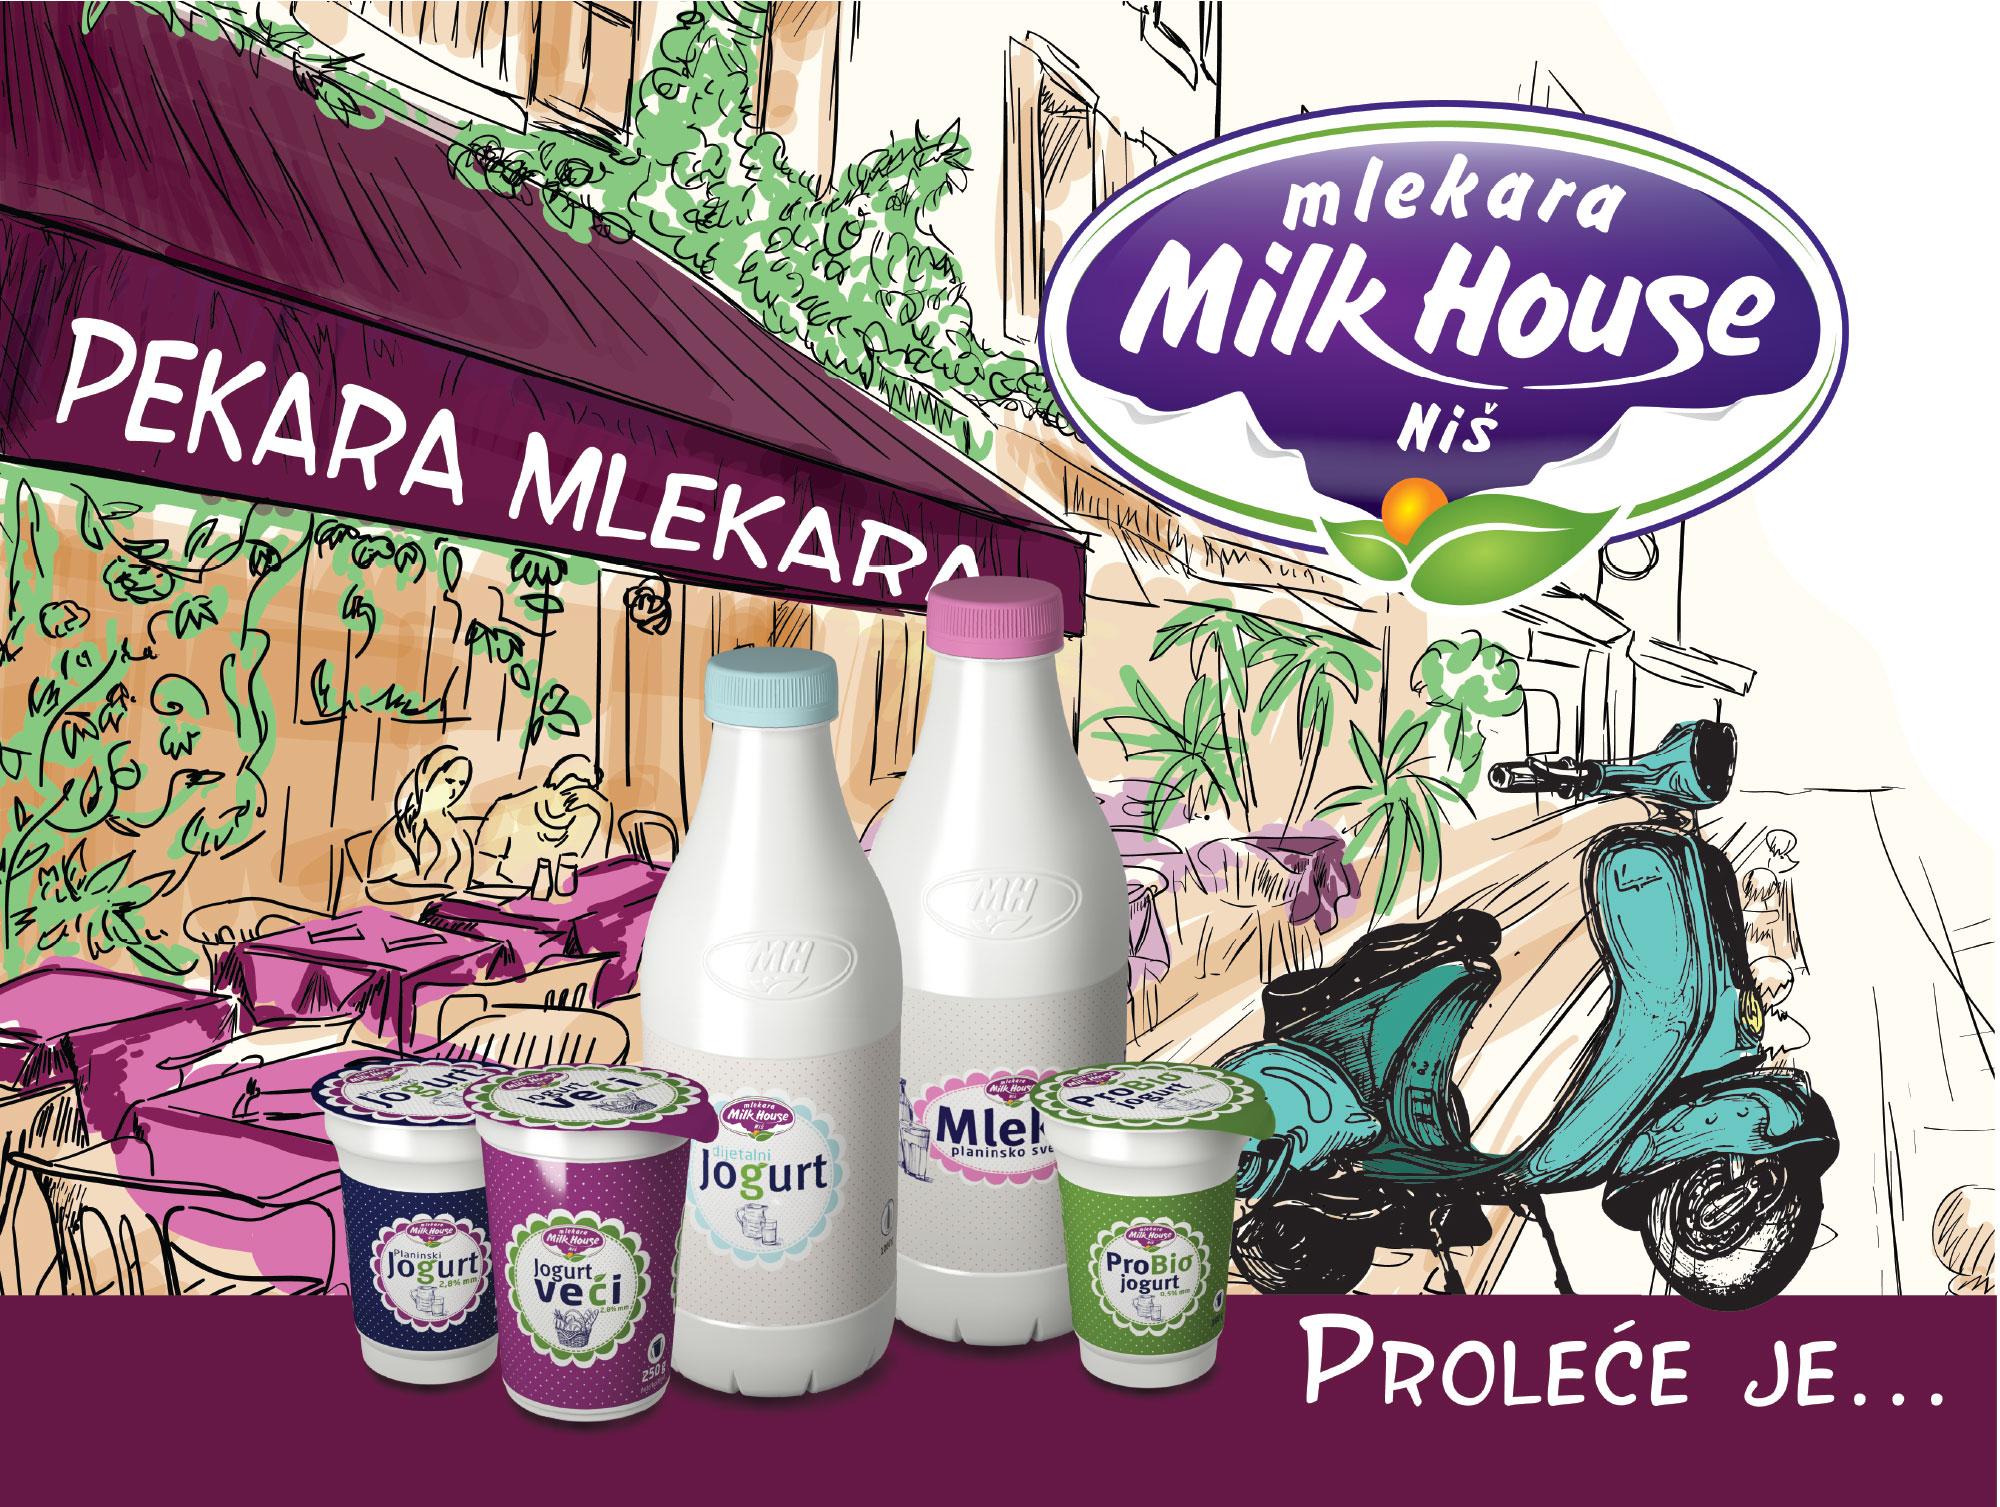 pekara mlekara